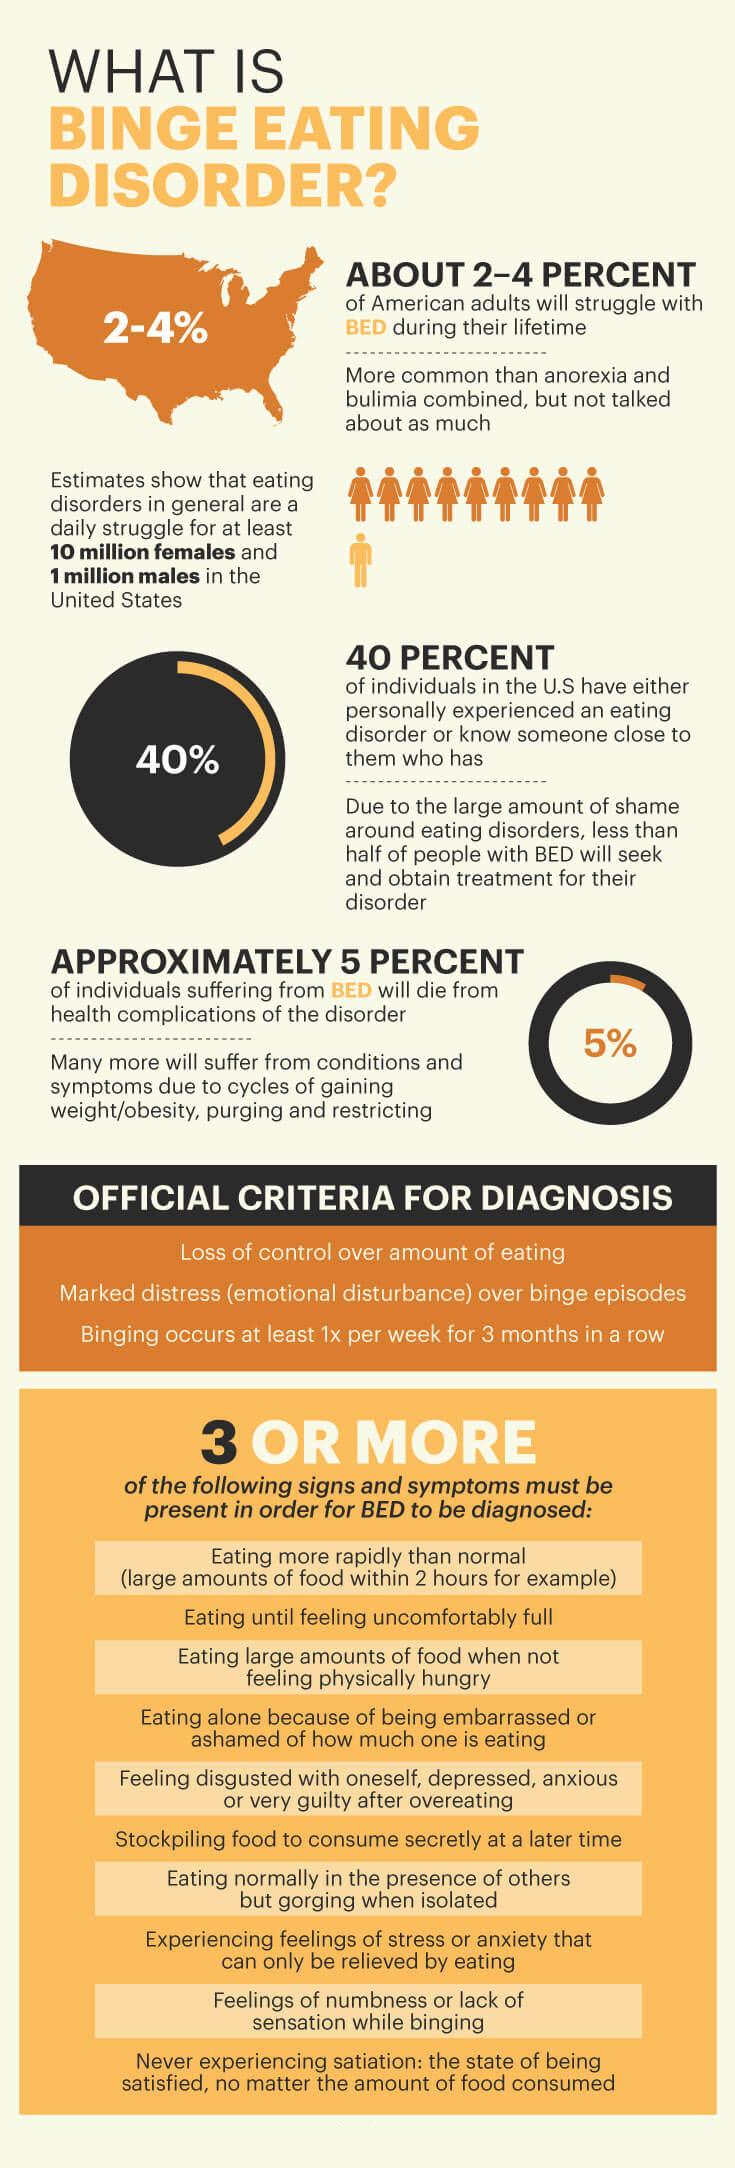 Binge eating disorder facts - MKexpress.net